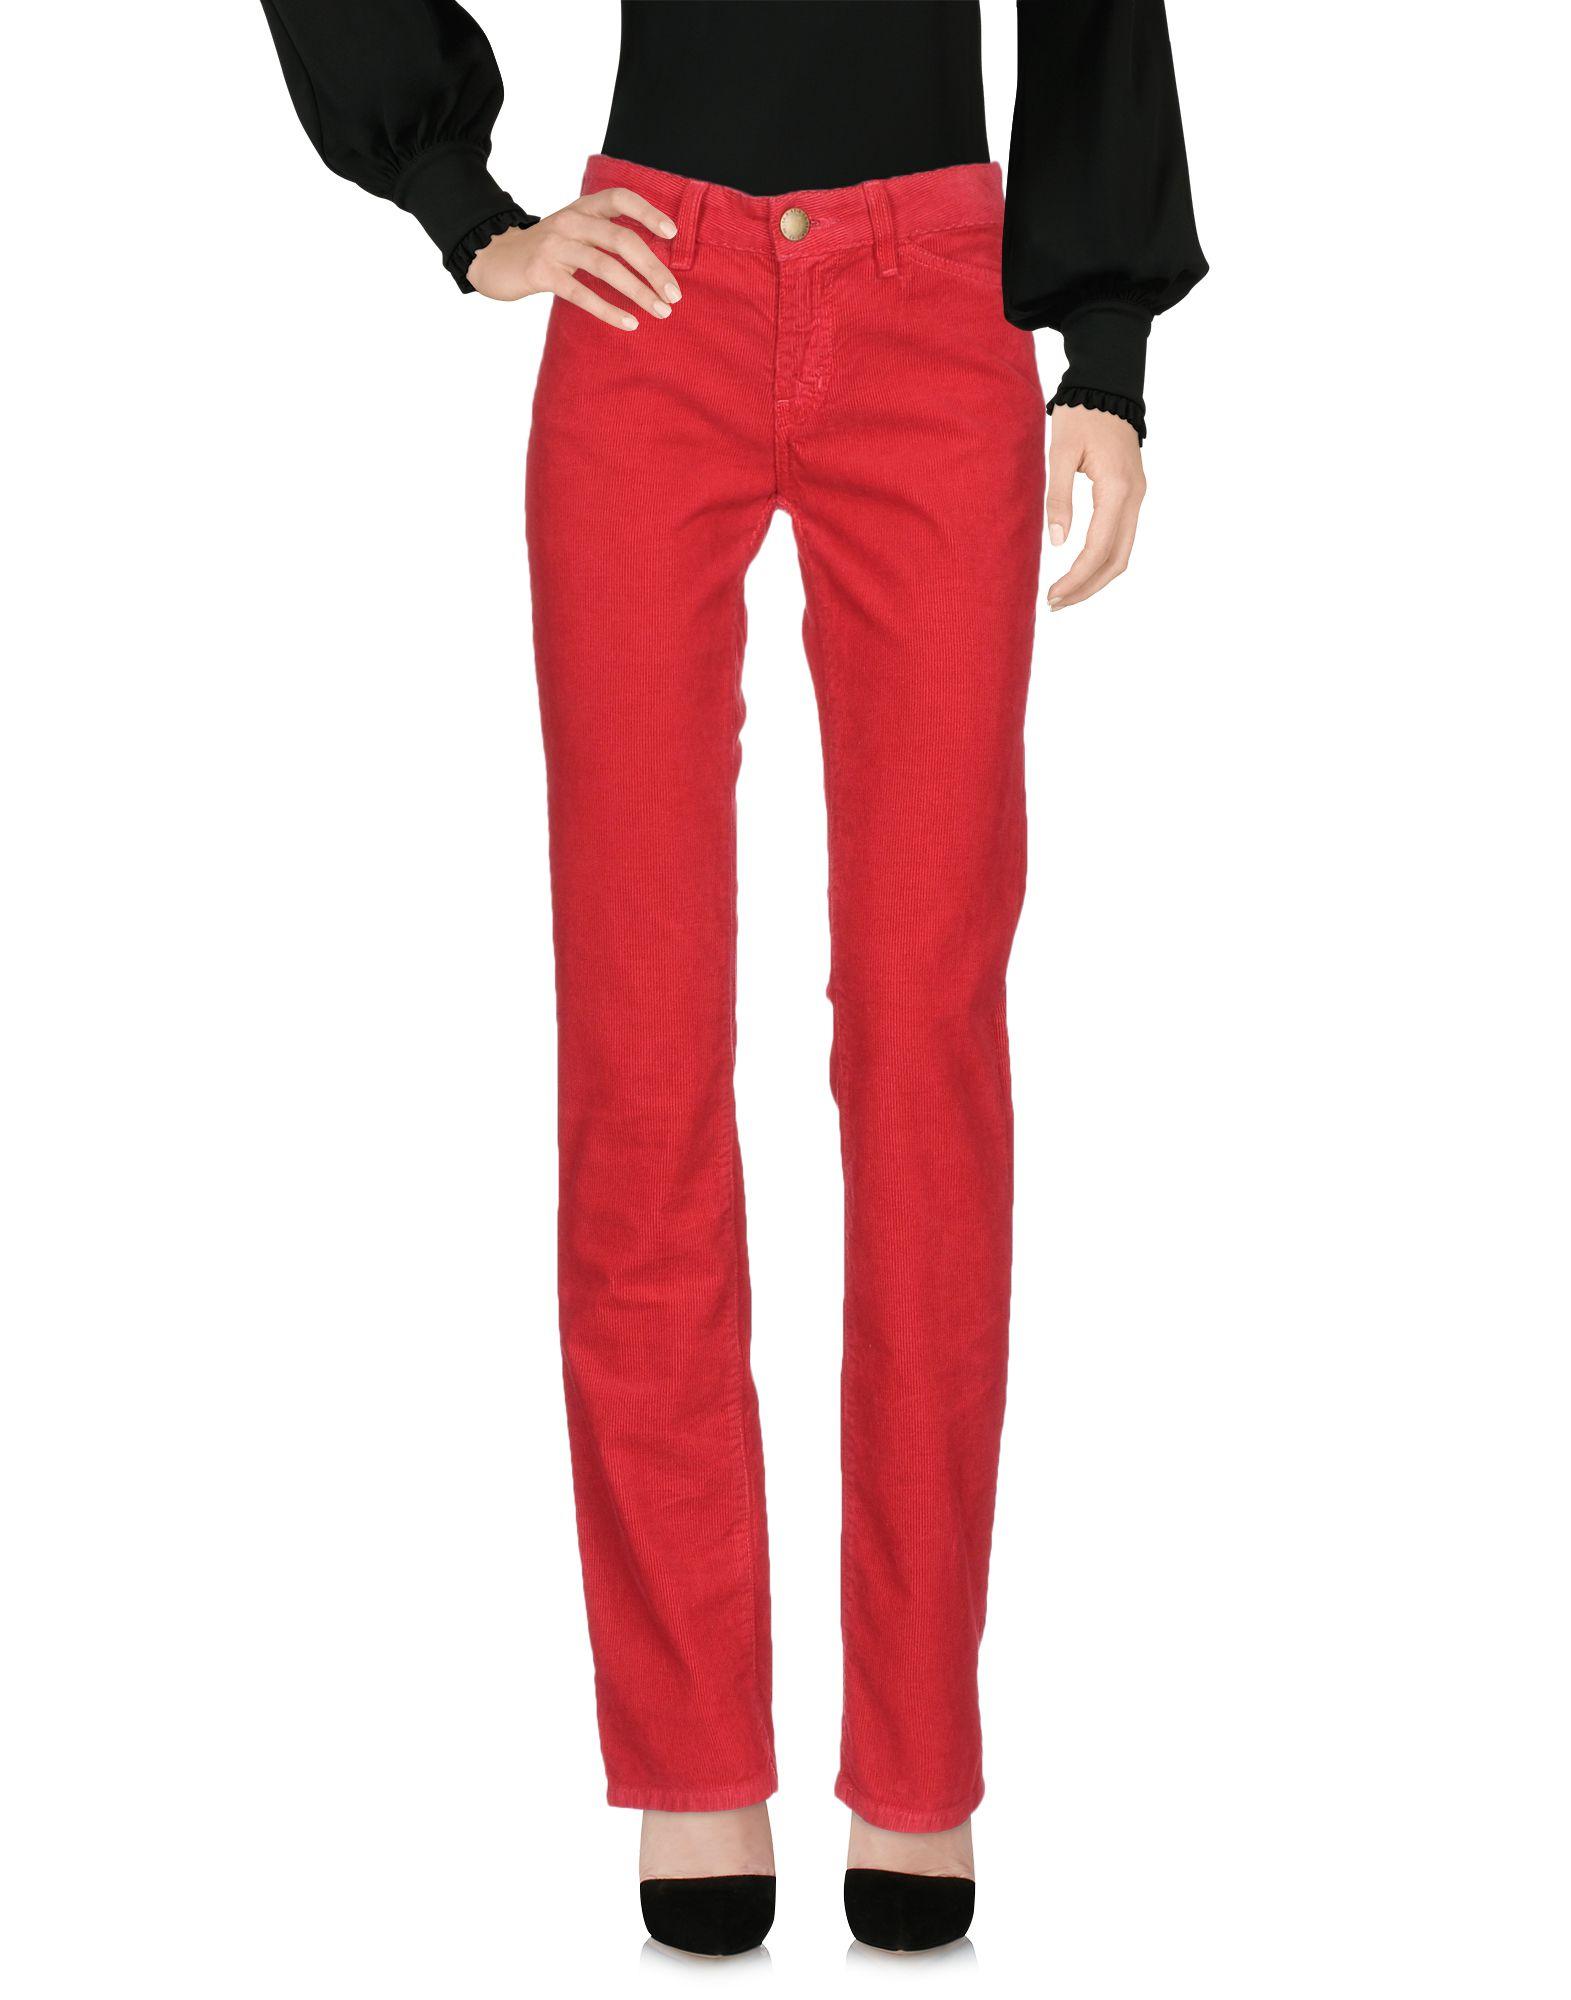 Pantalone Current Elliott + Charlotte Gainsbourg damen - 13180089NU